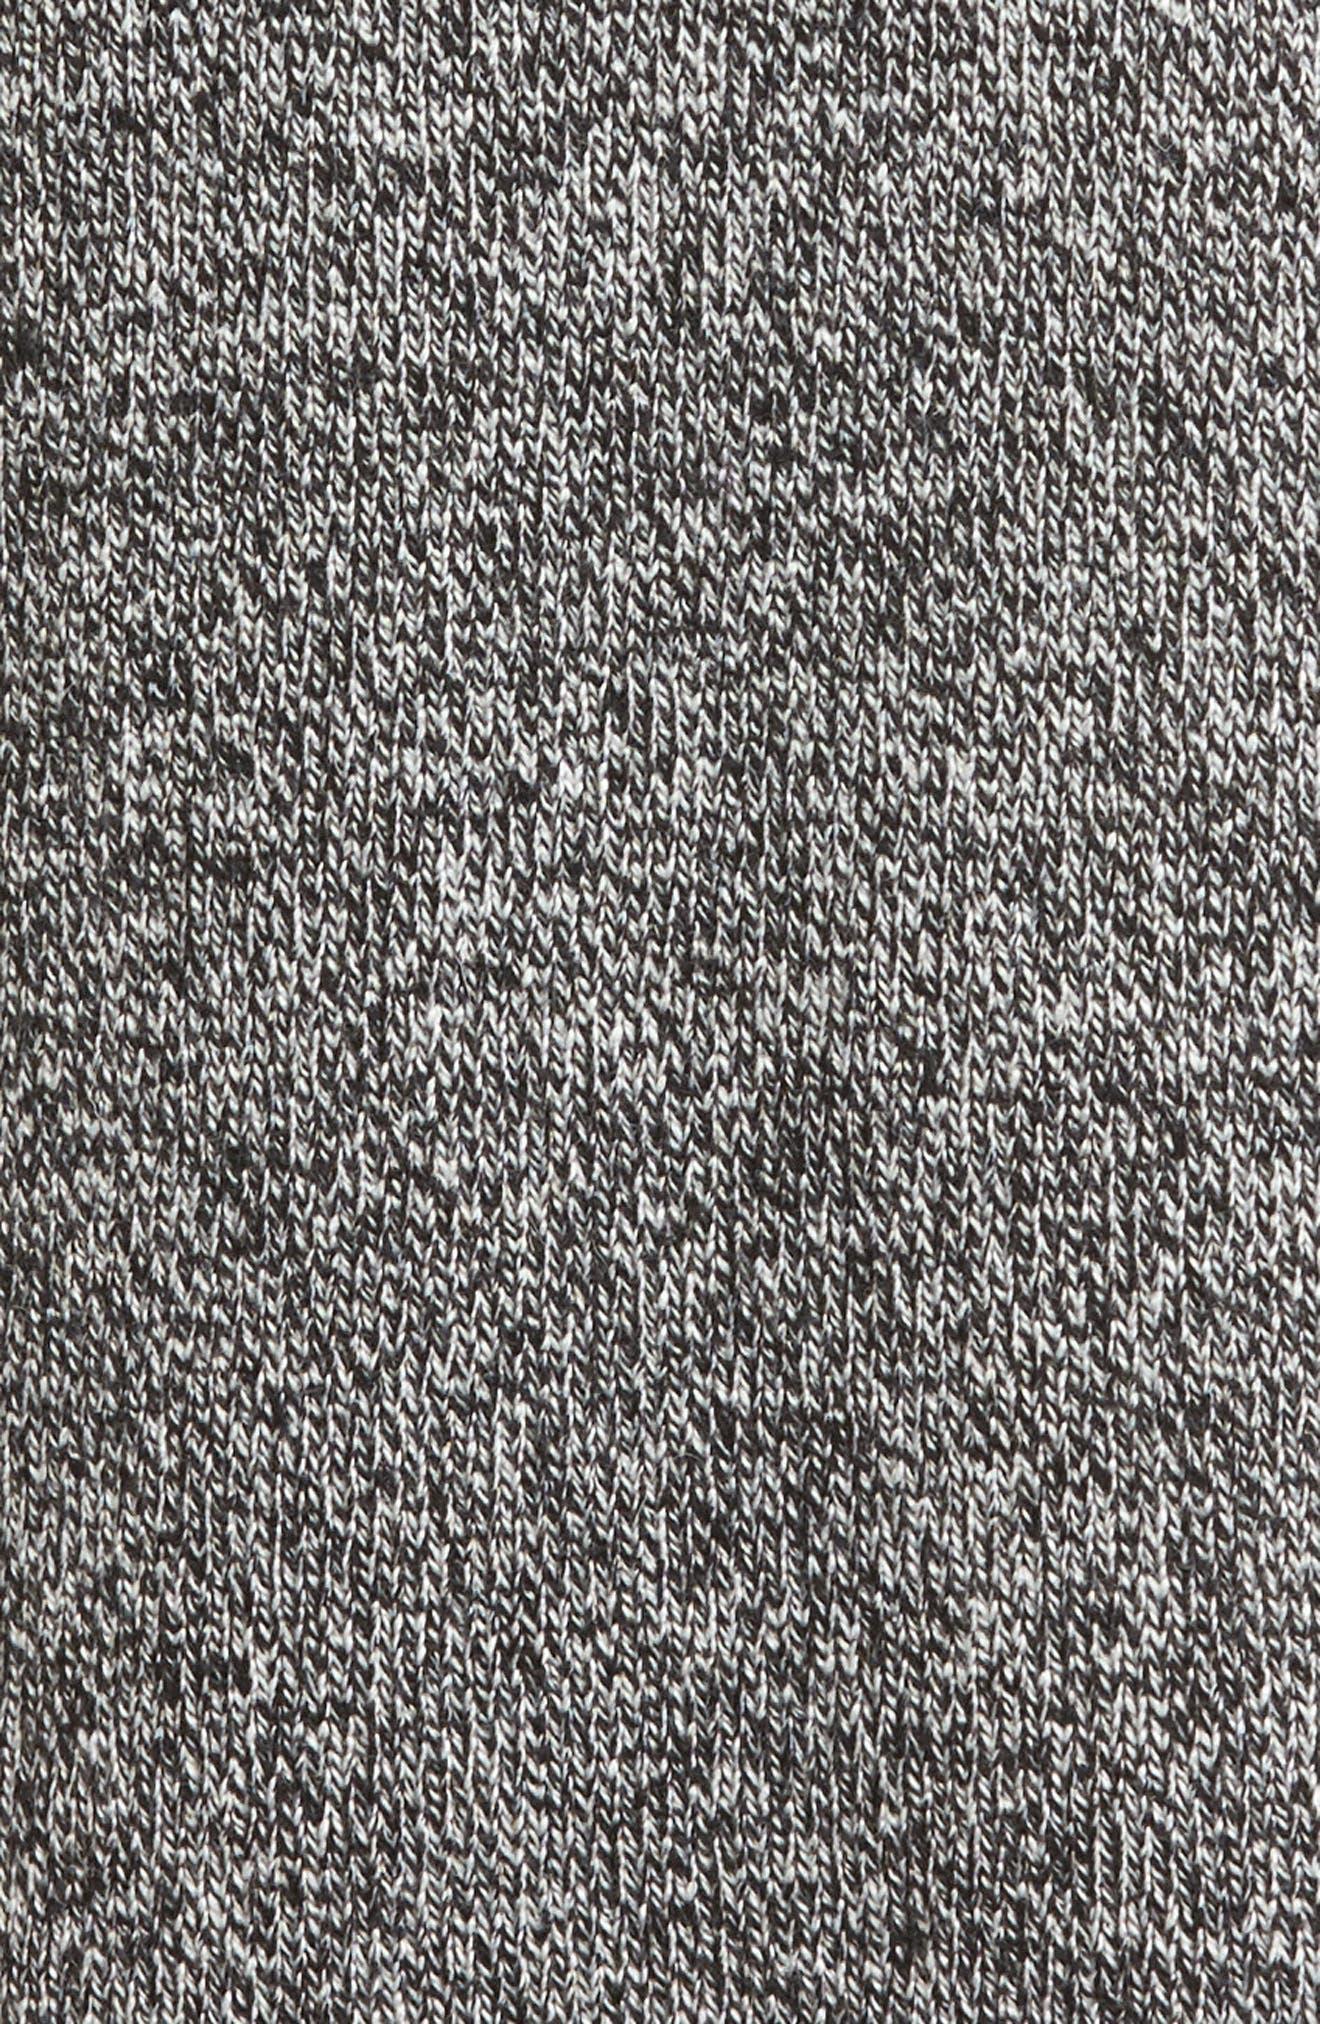 Side Slit Sweater,                             Alternate thumbnail 5, color,                             Charcoal